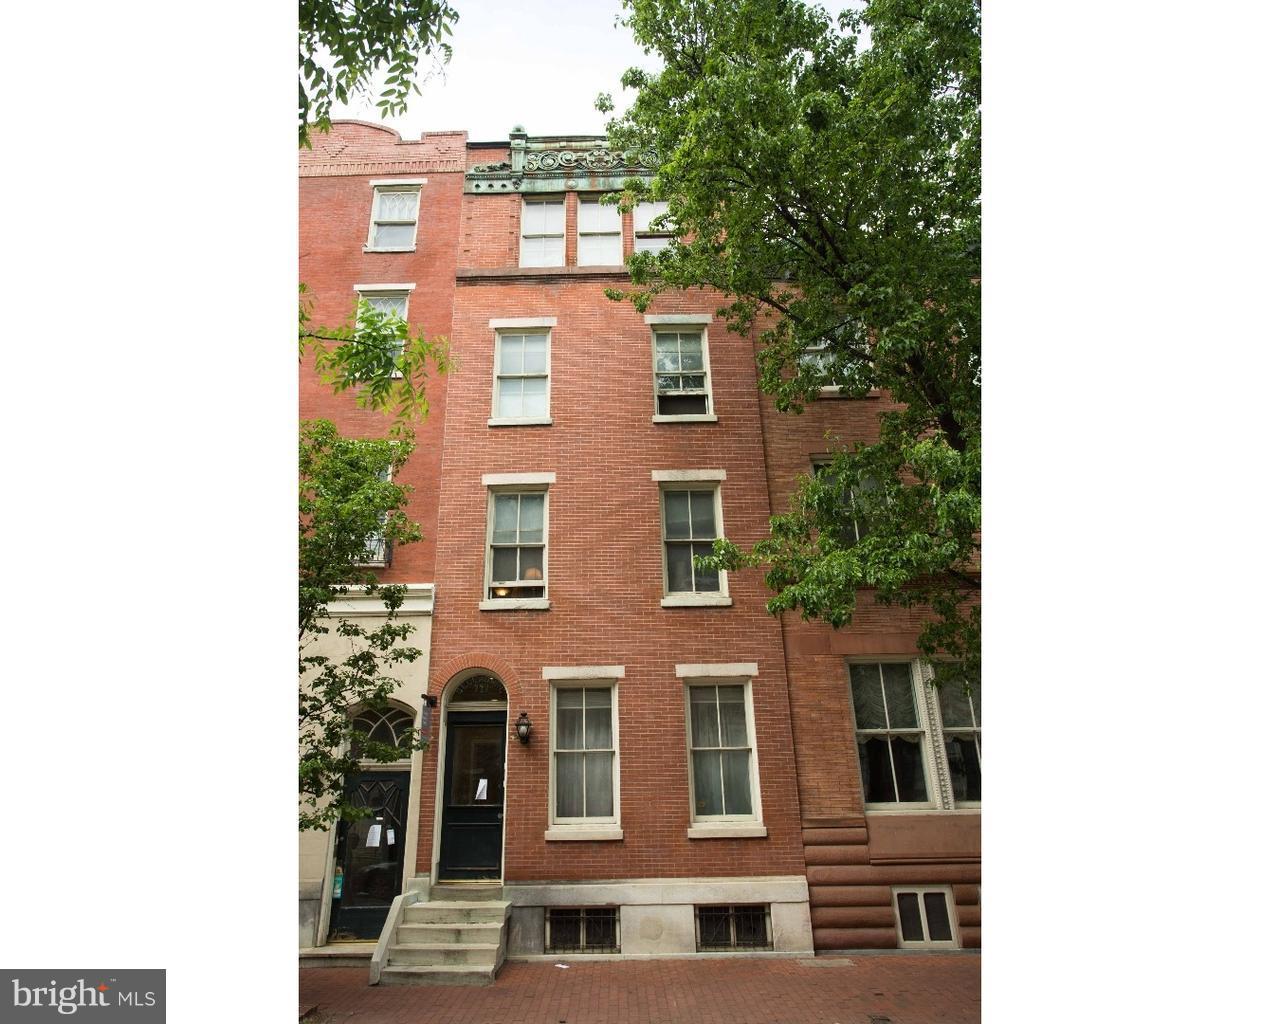 721 Spruce Street Philadelphia, PA 19106